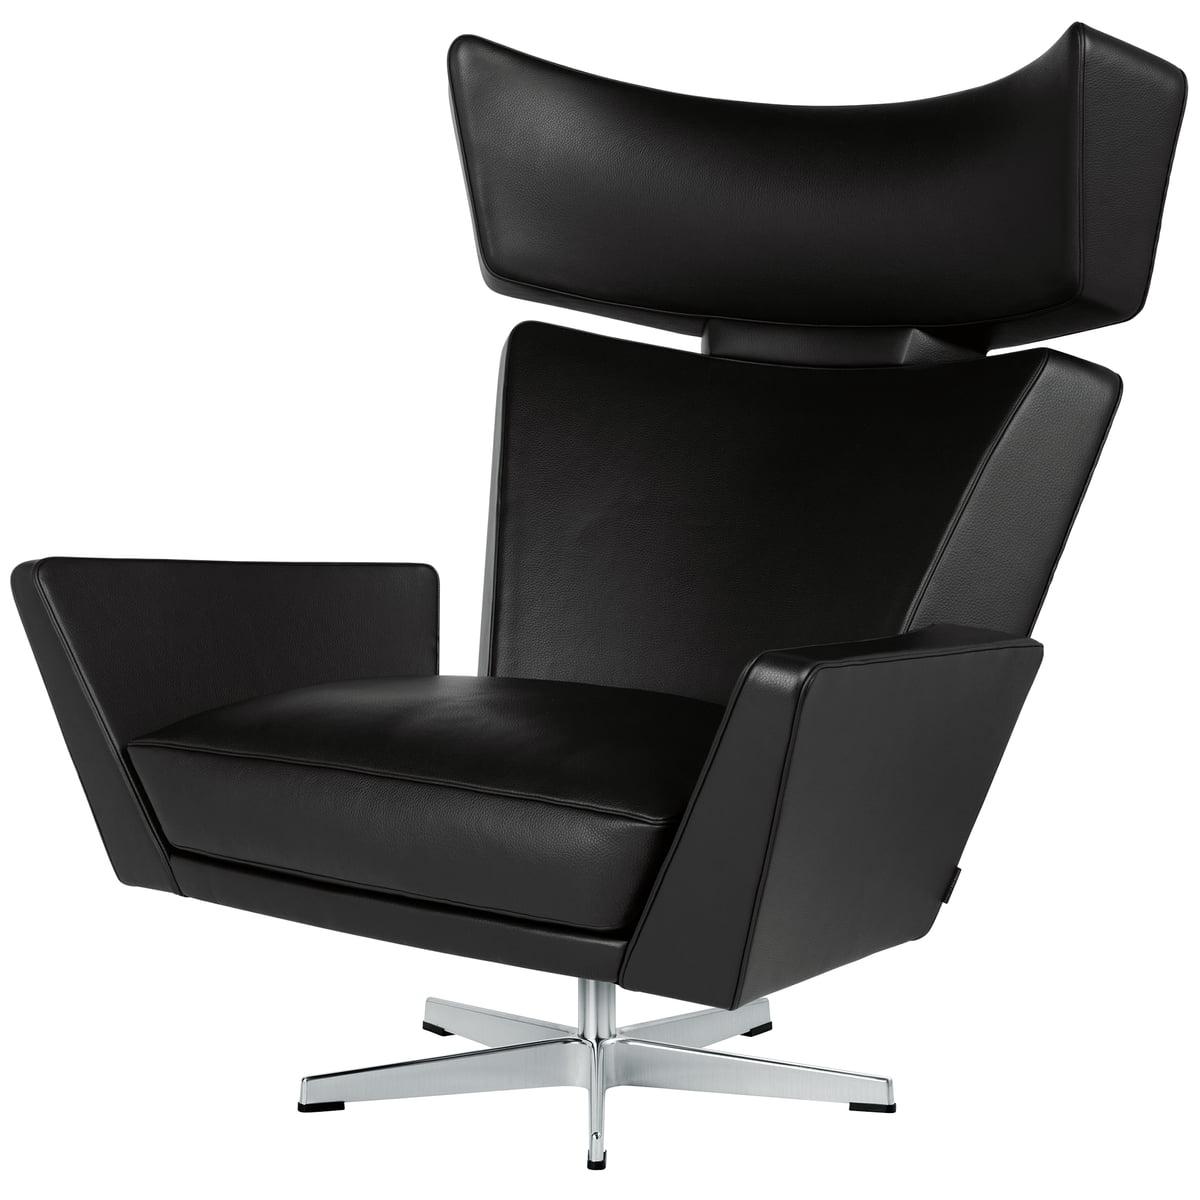 oksen leder sessel fritz hansen connox. Black Bedroom Furniture Sets. Home Design Ideas